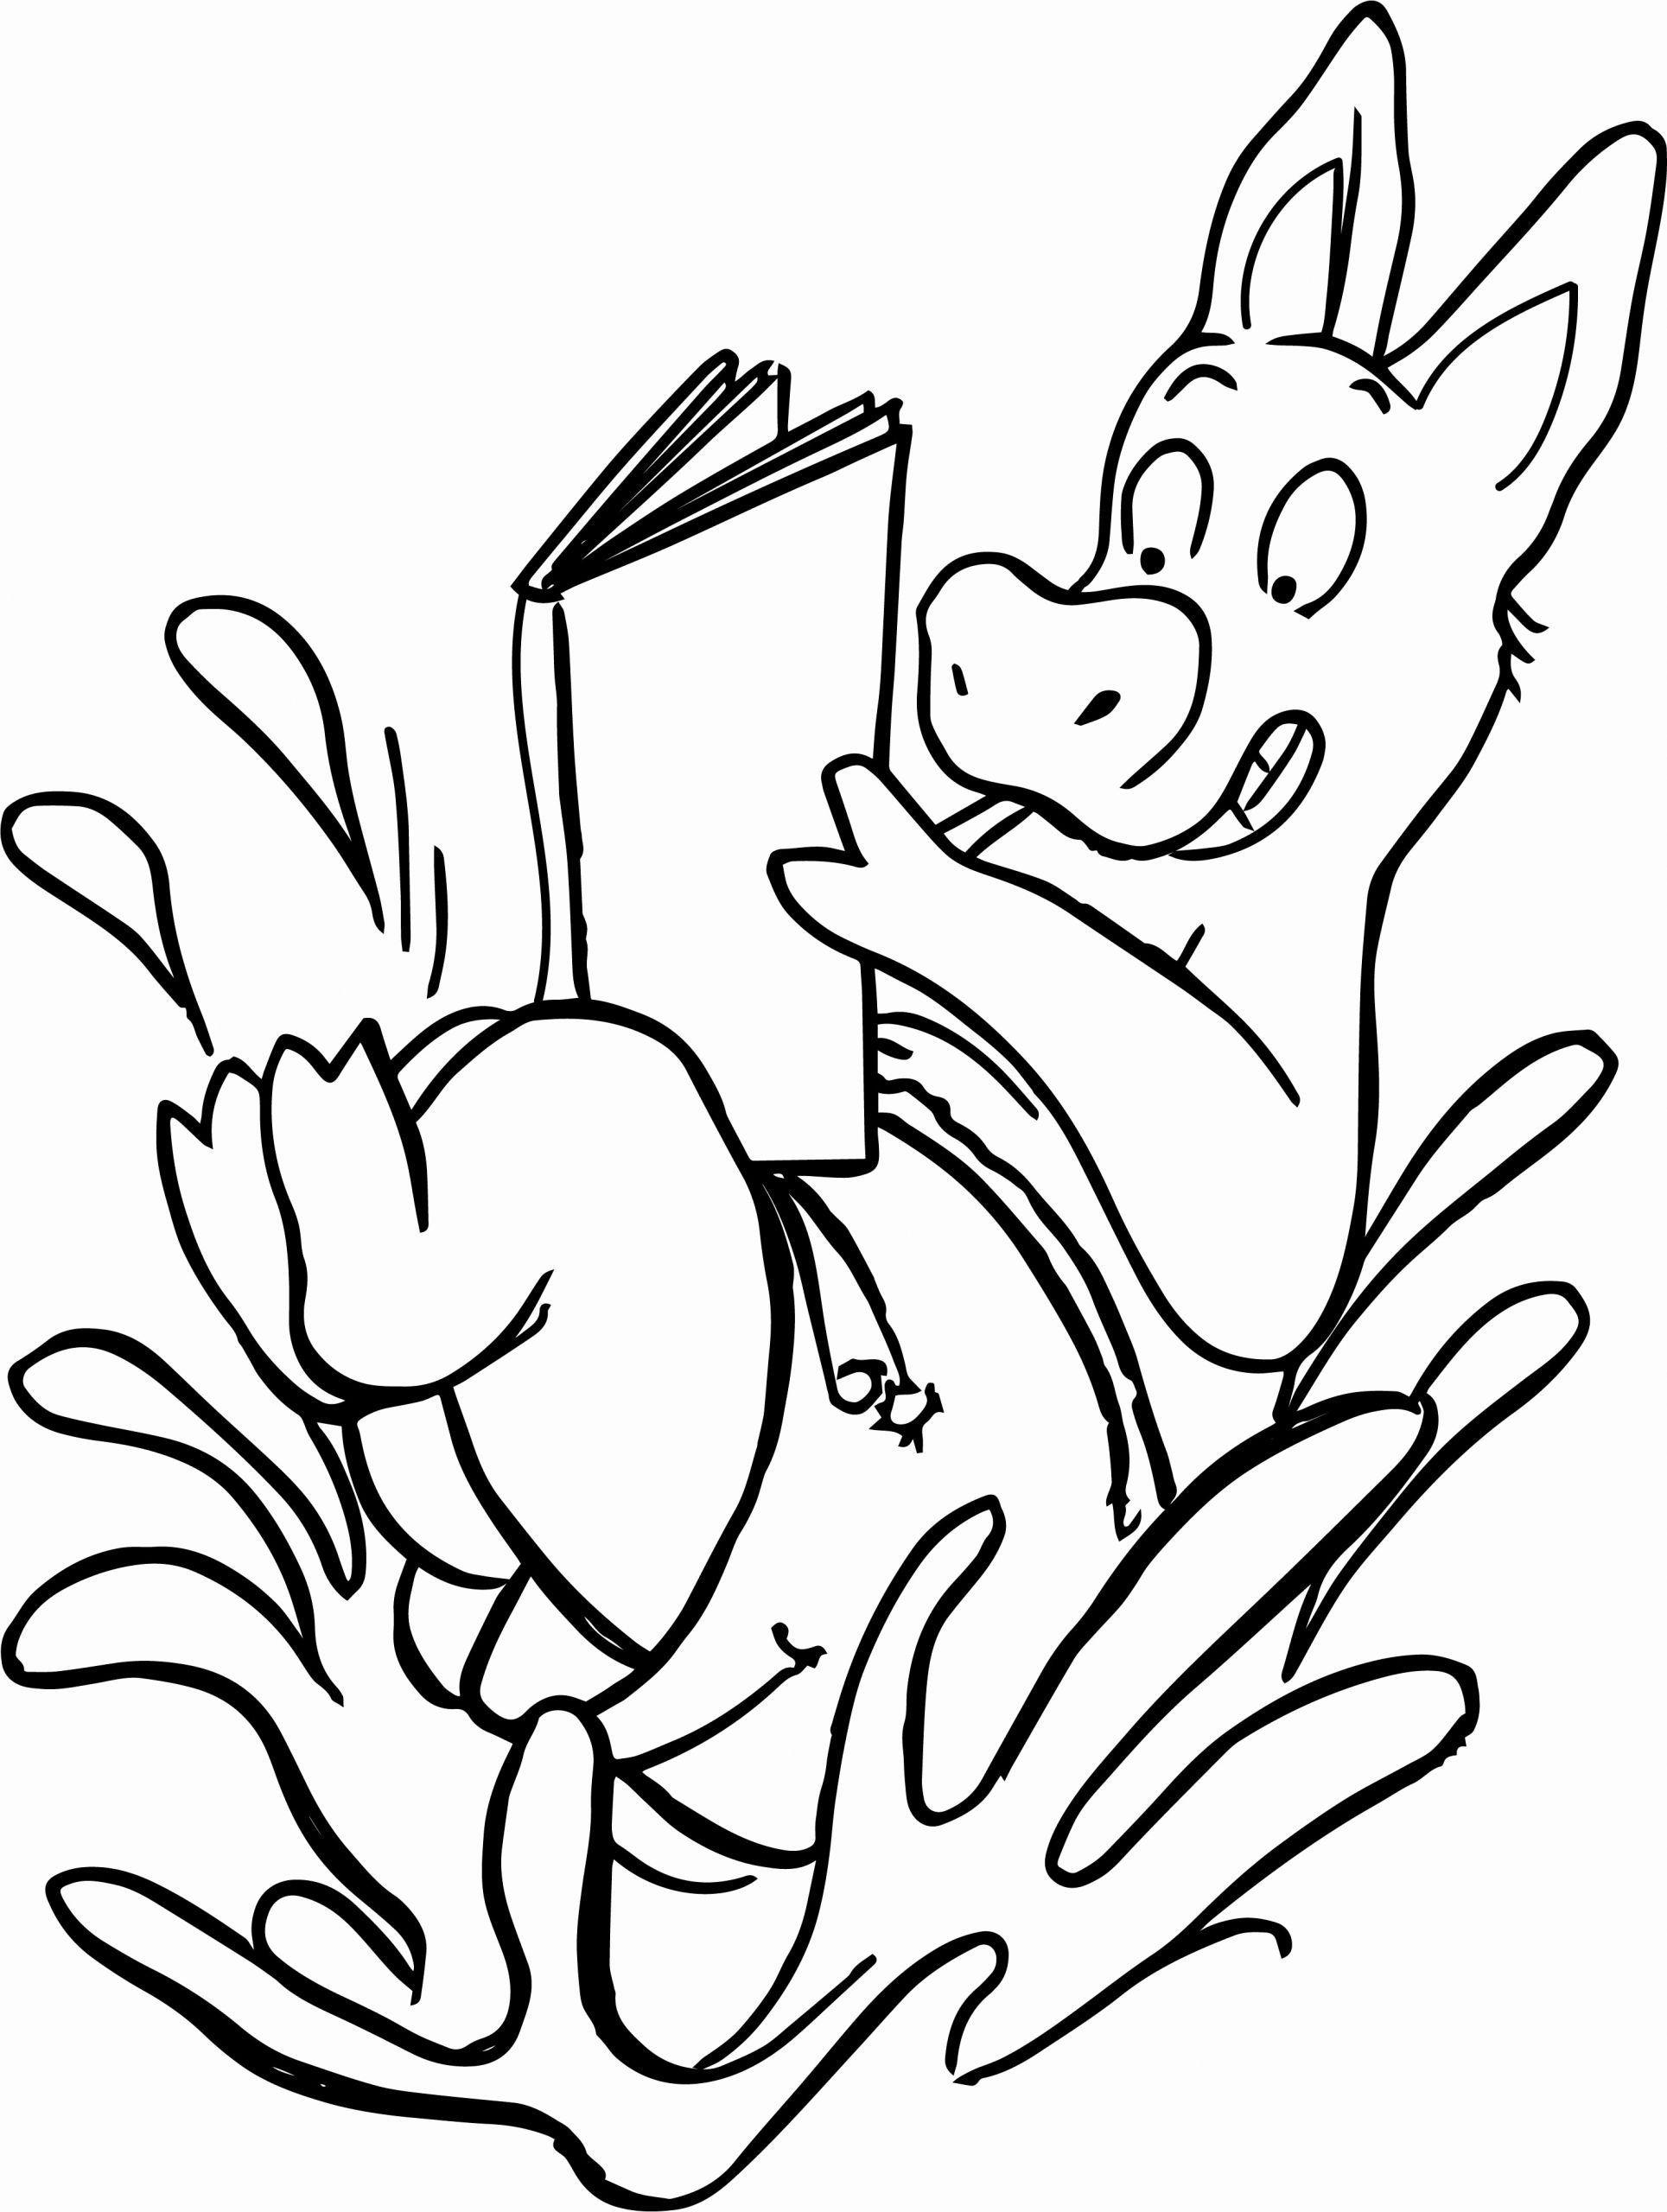 Summer Reading Coloring Sheet Tips